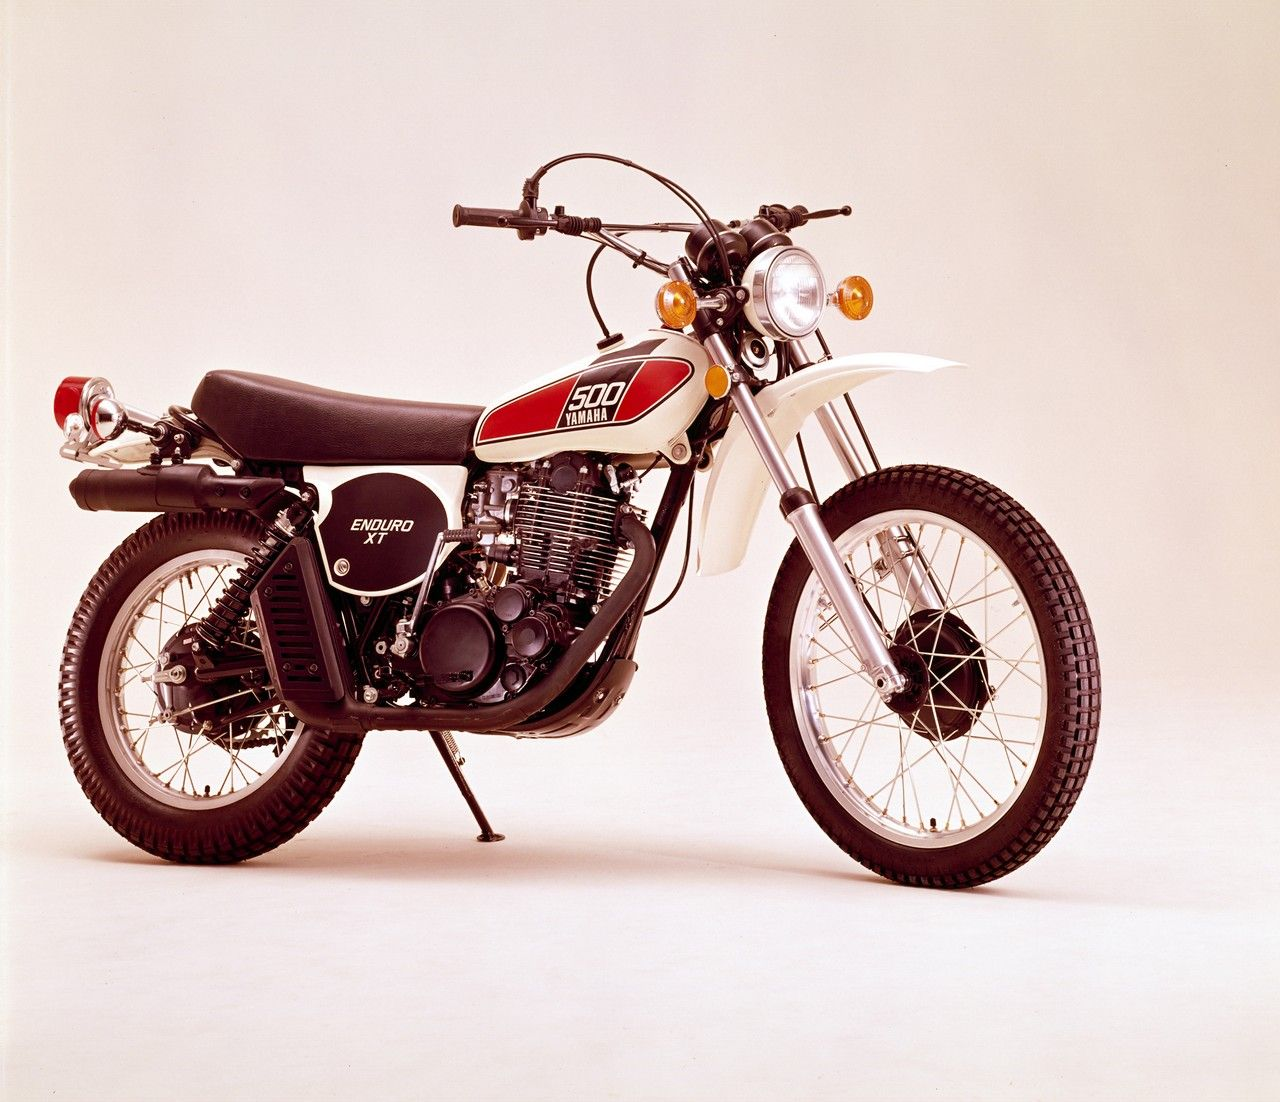 yamaha xt 500 yamaha moto enduro storia vintage. Black Bedroom Furniture Sets. Home Design Ideas